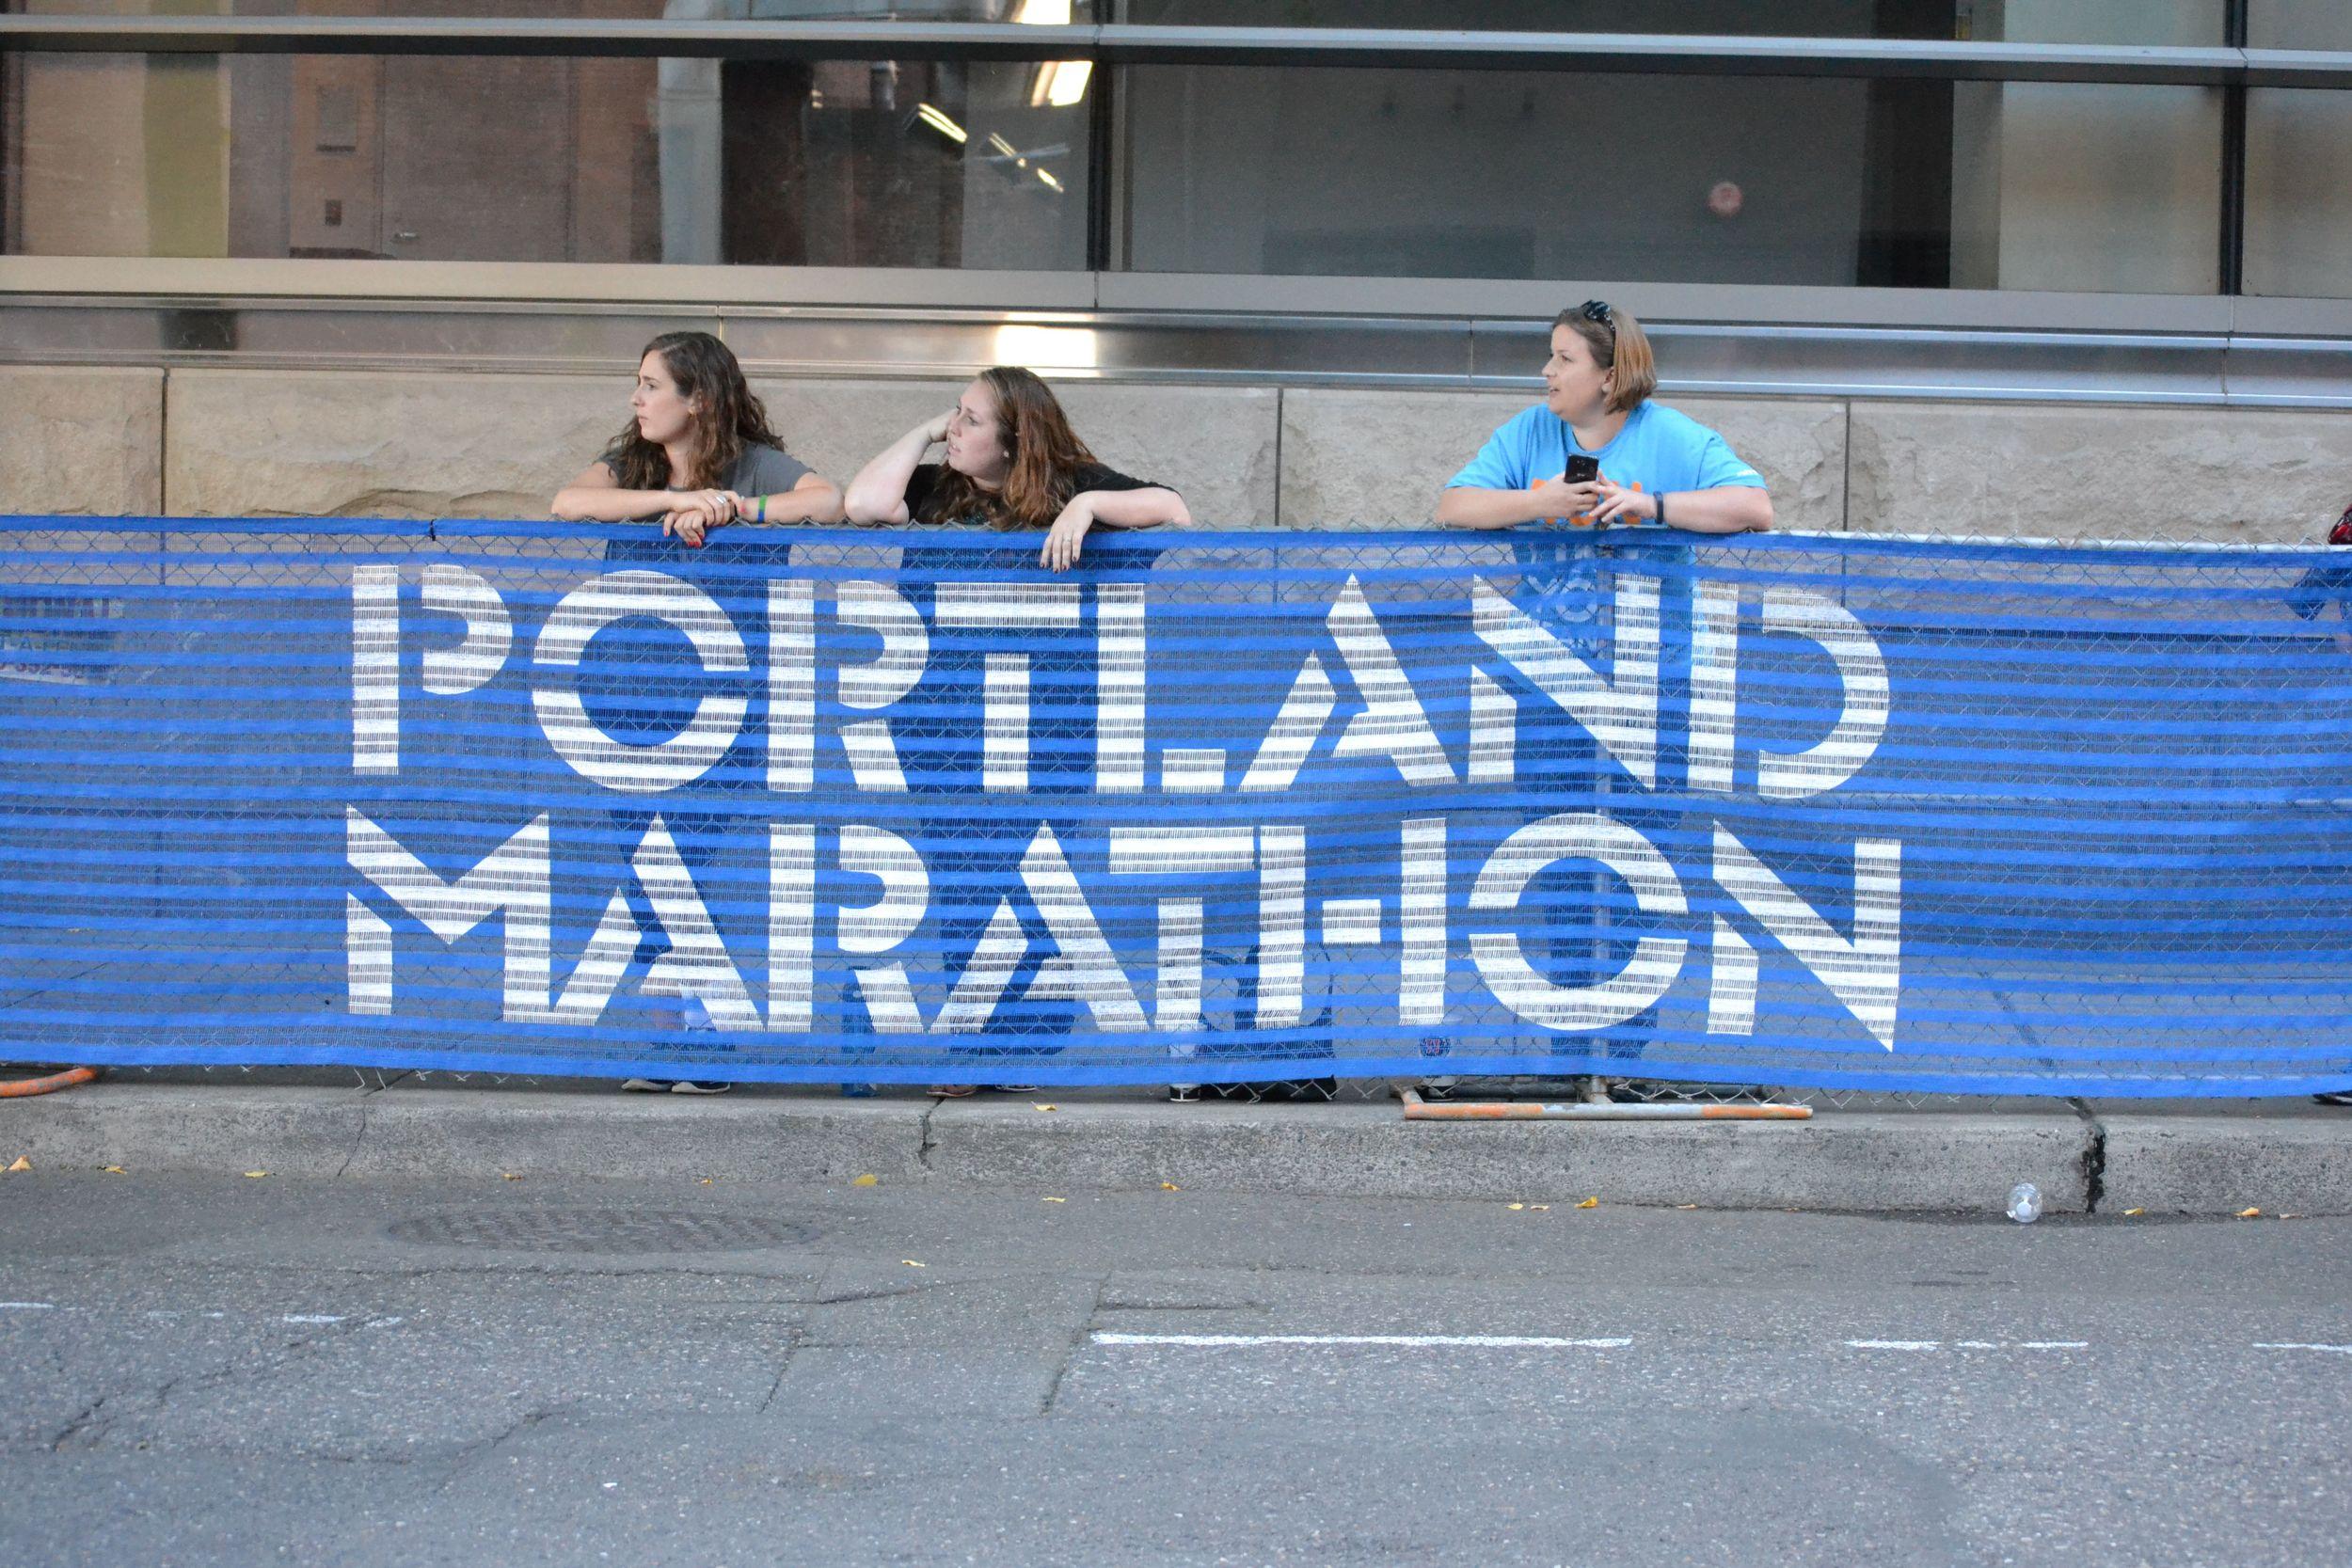 portlandmarathon.fans